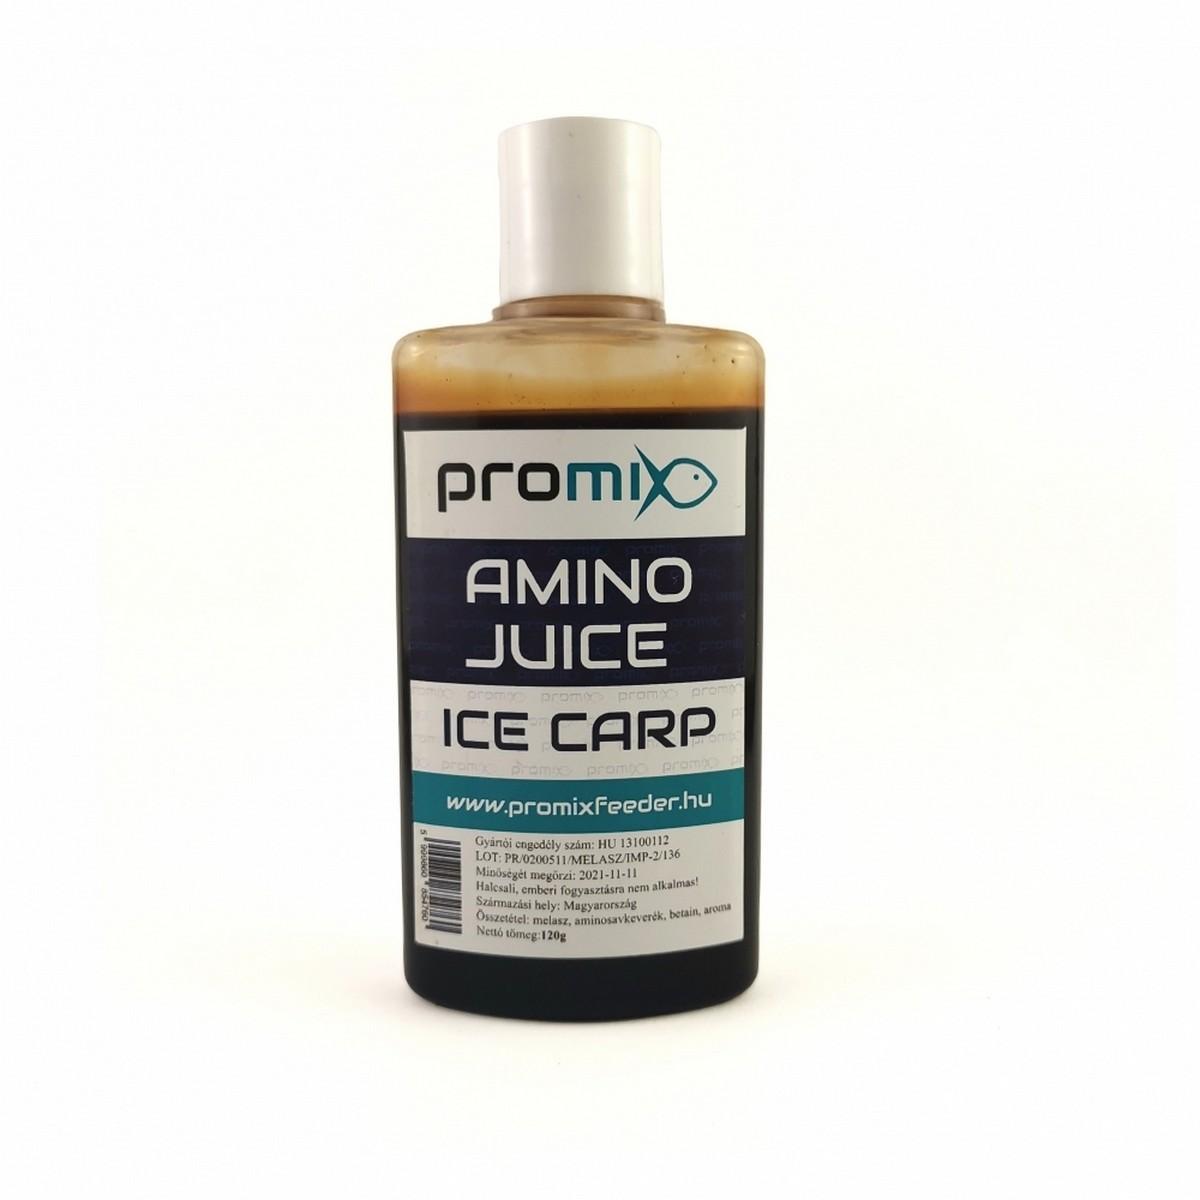 PROMIX AMINO JUICE ICE CARP